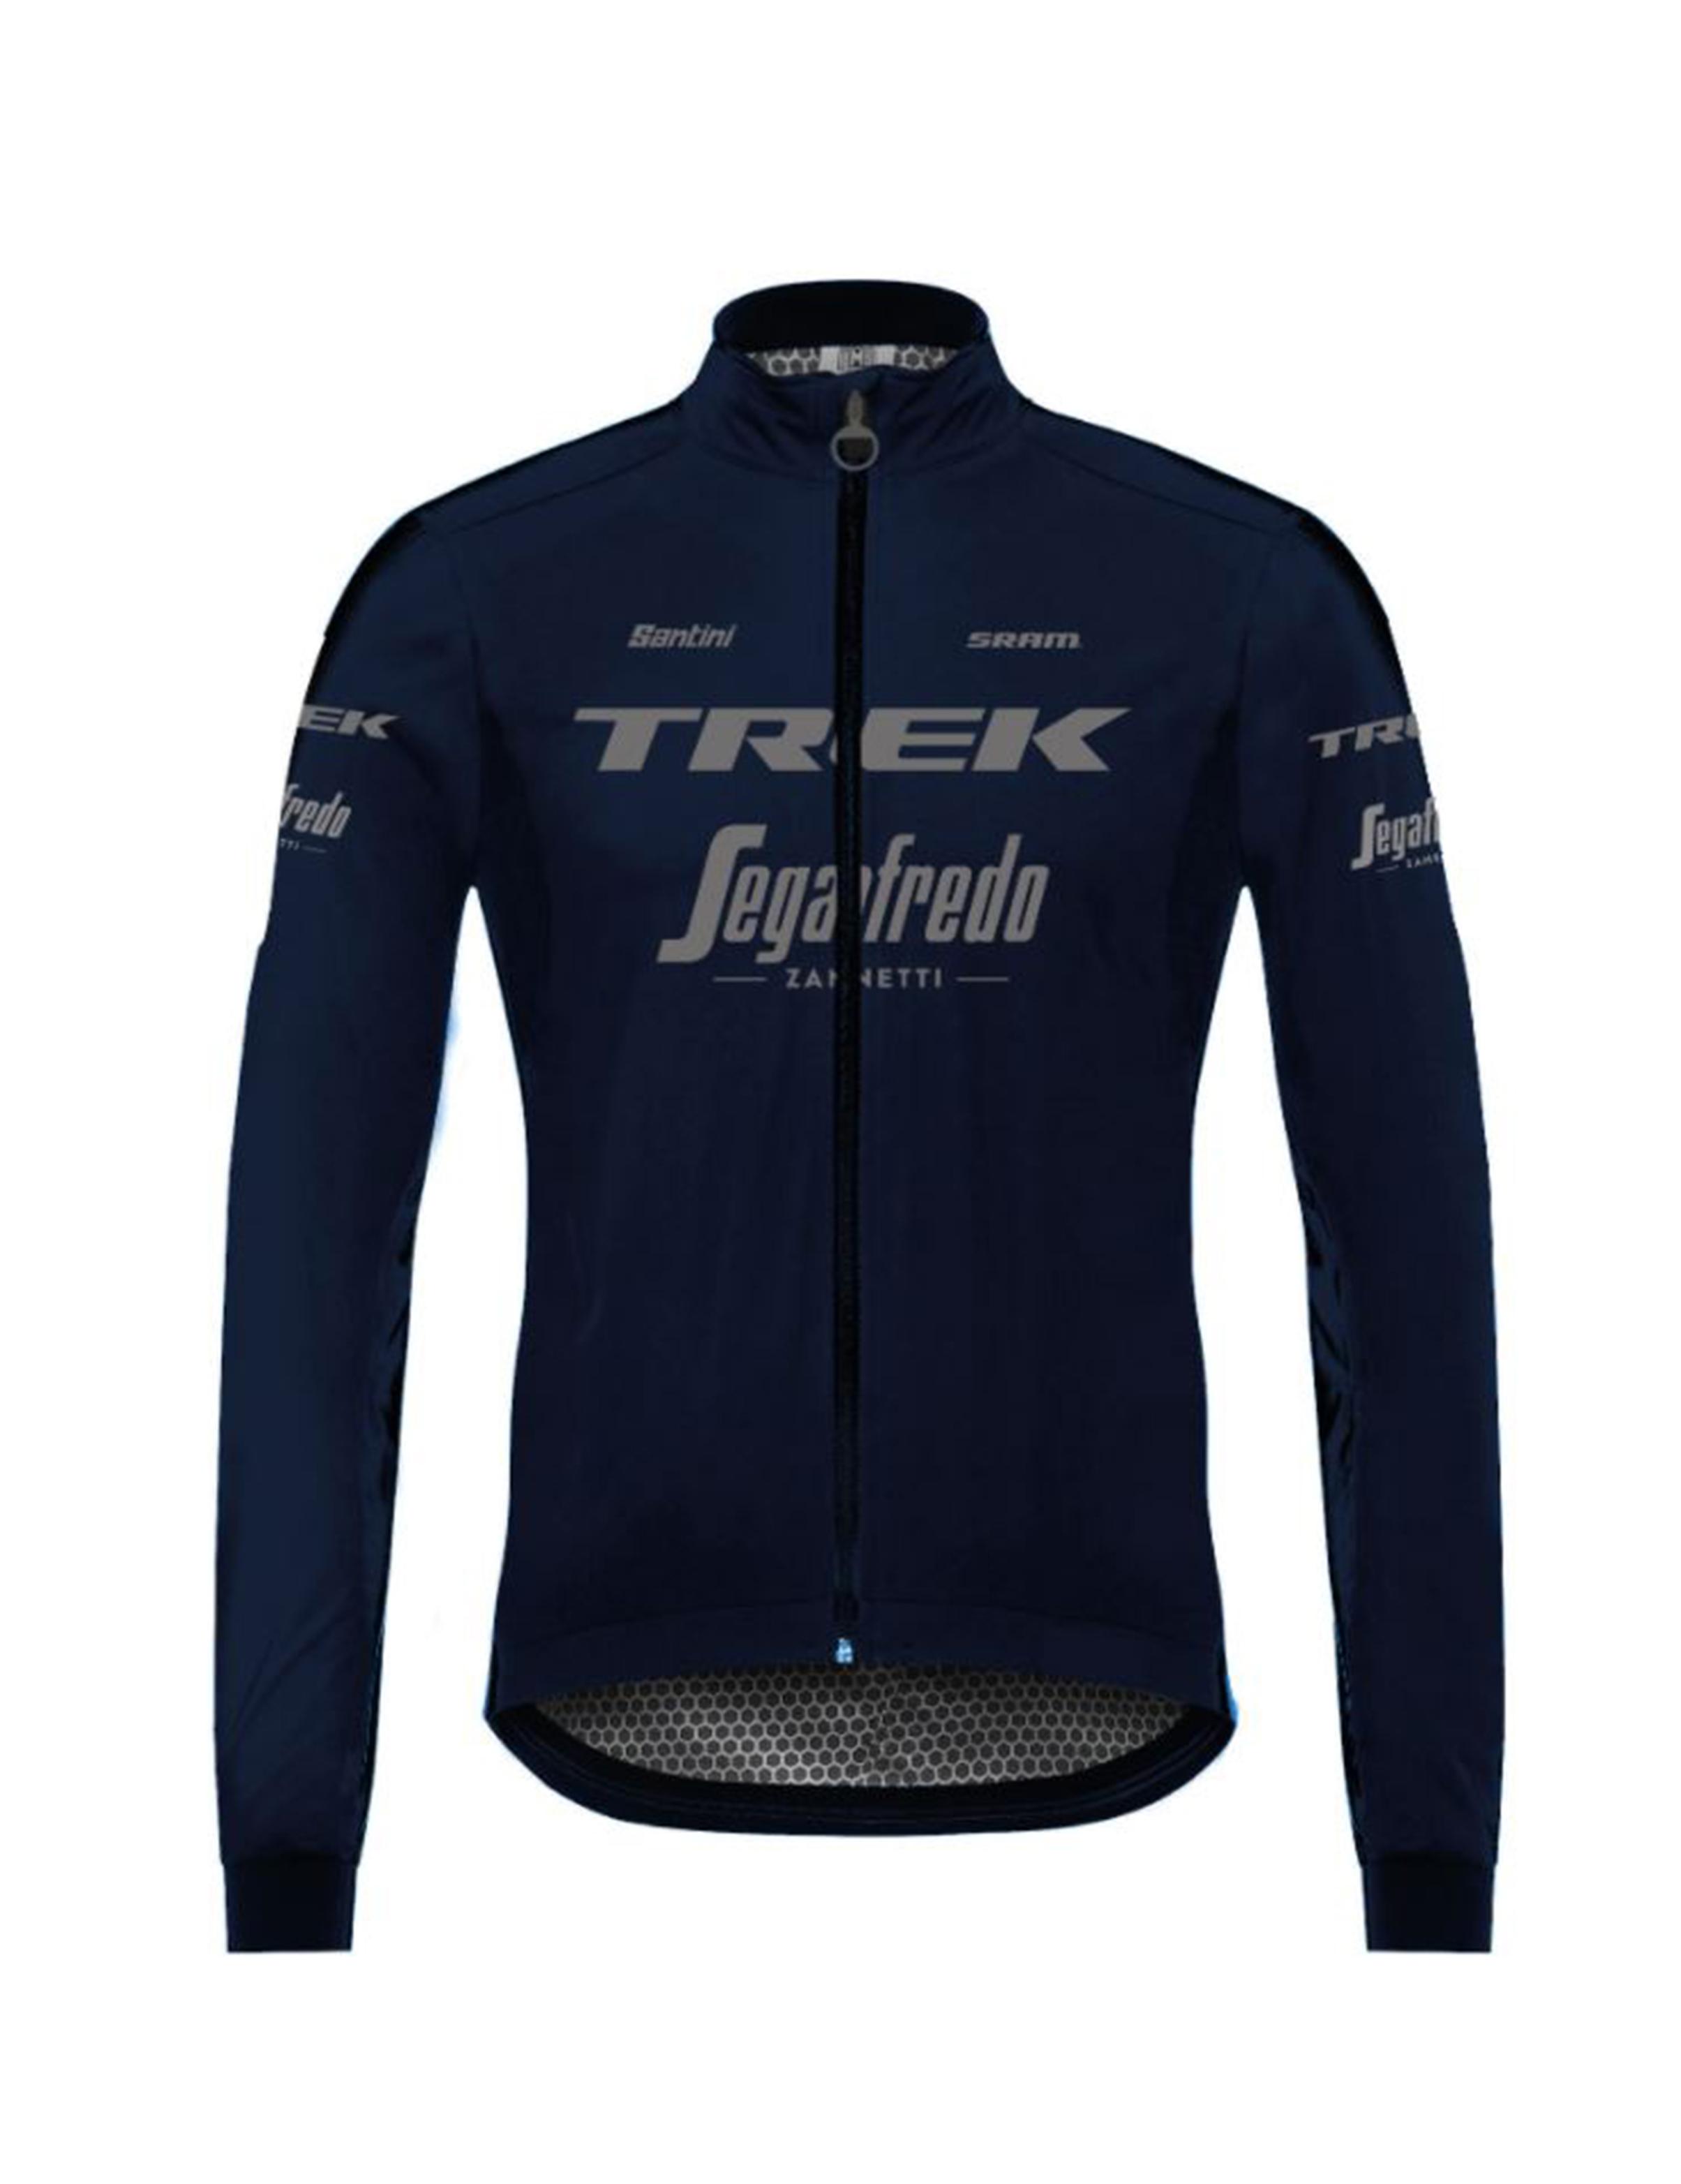 SMS Santini TERK 騎行服 MTB 山地自行車公路自行車長袖自行車上衣